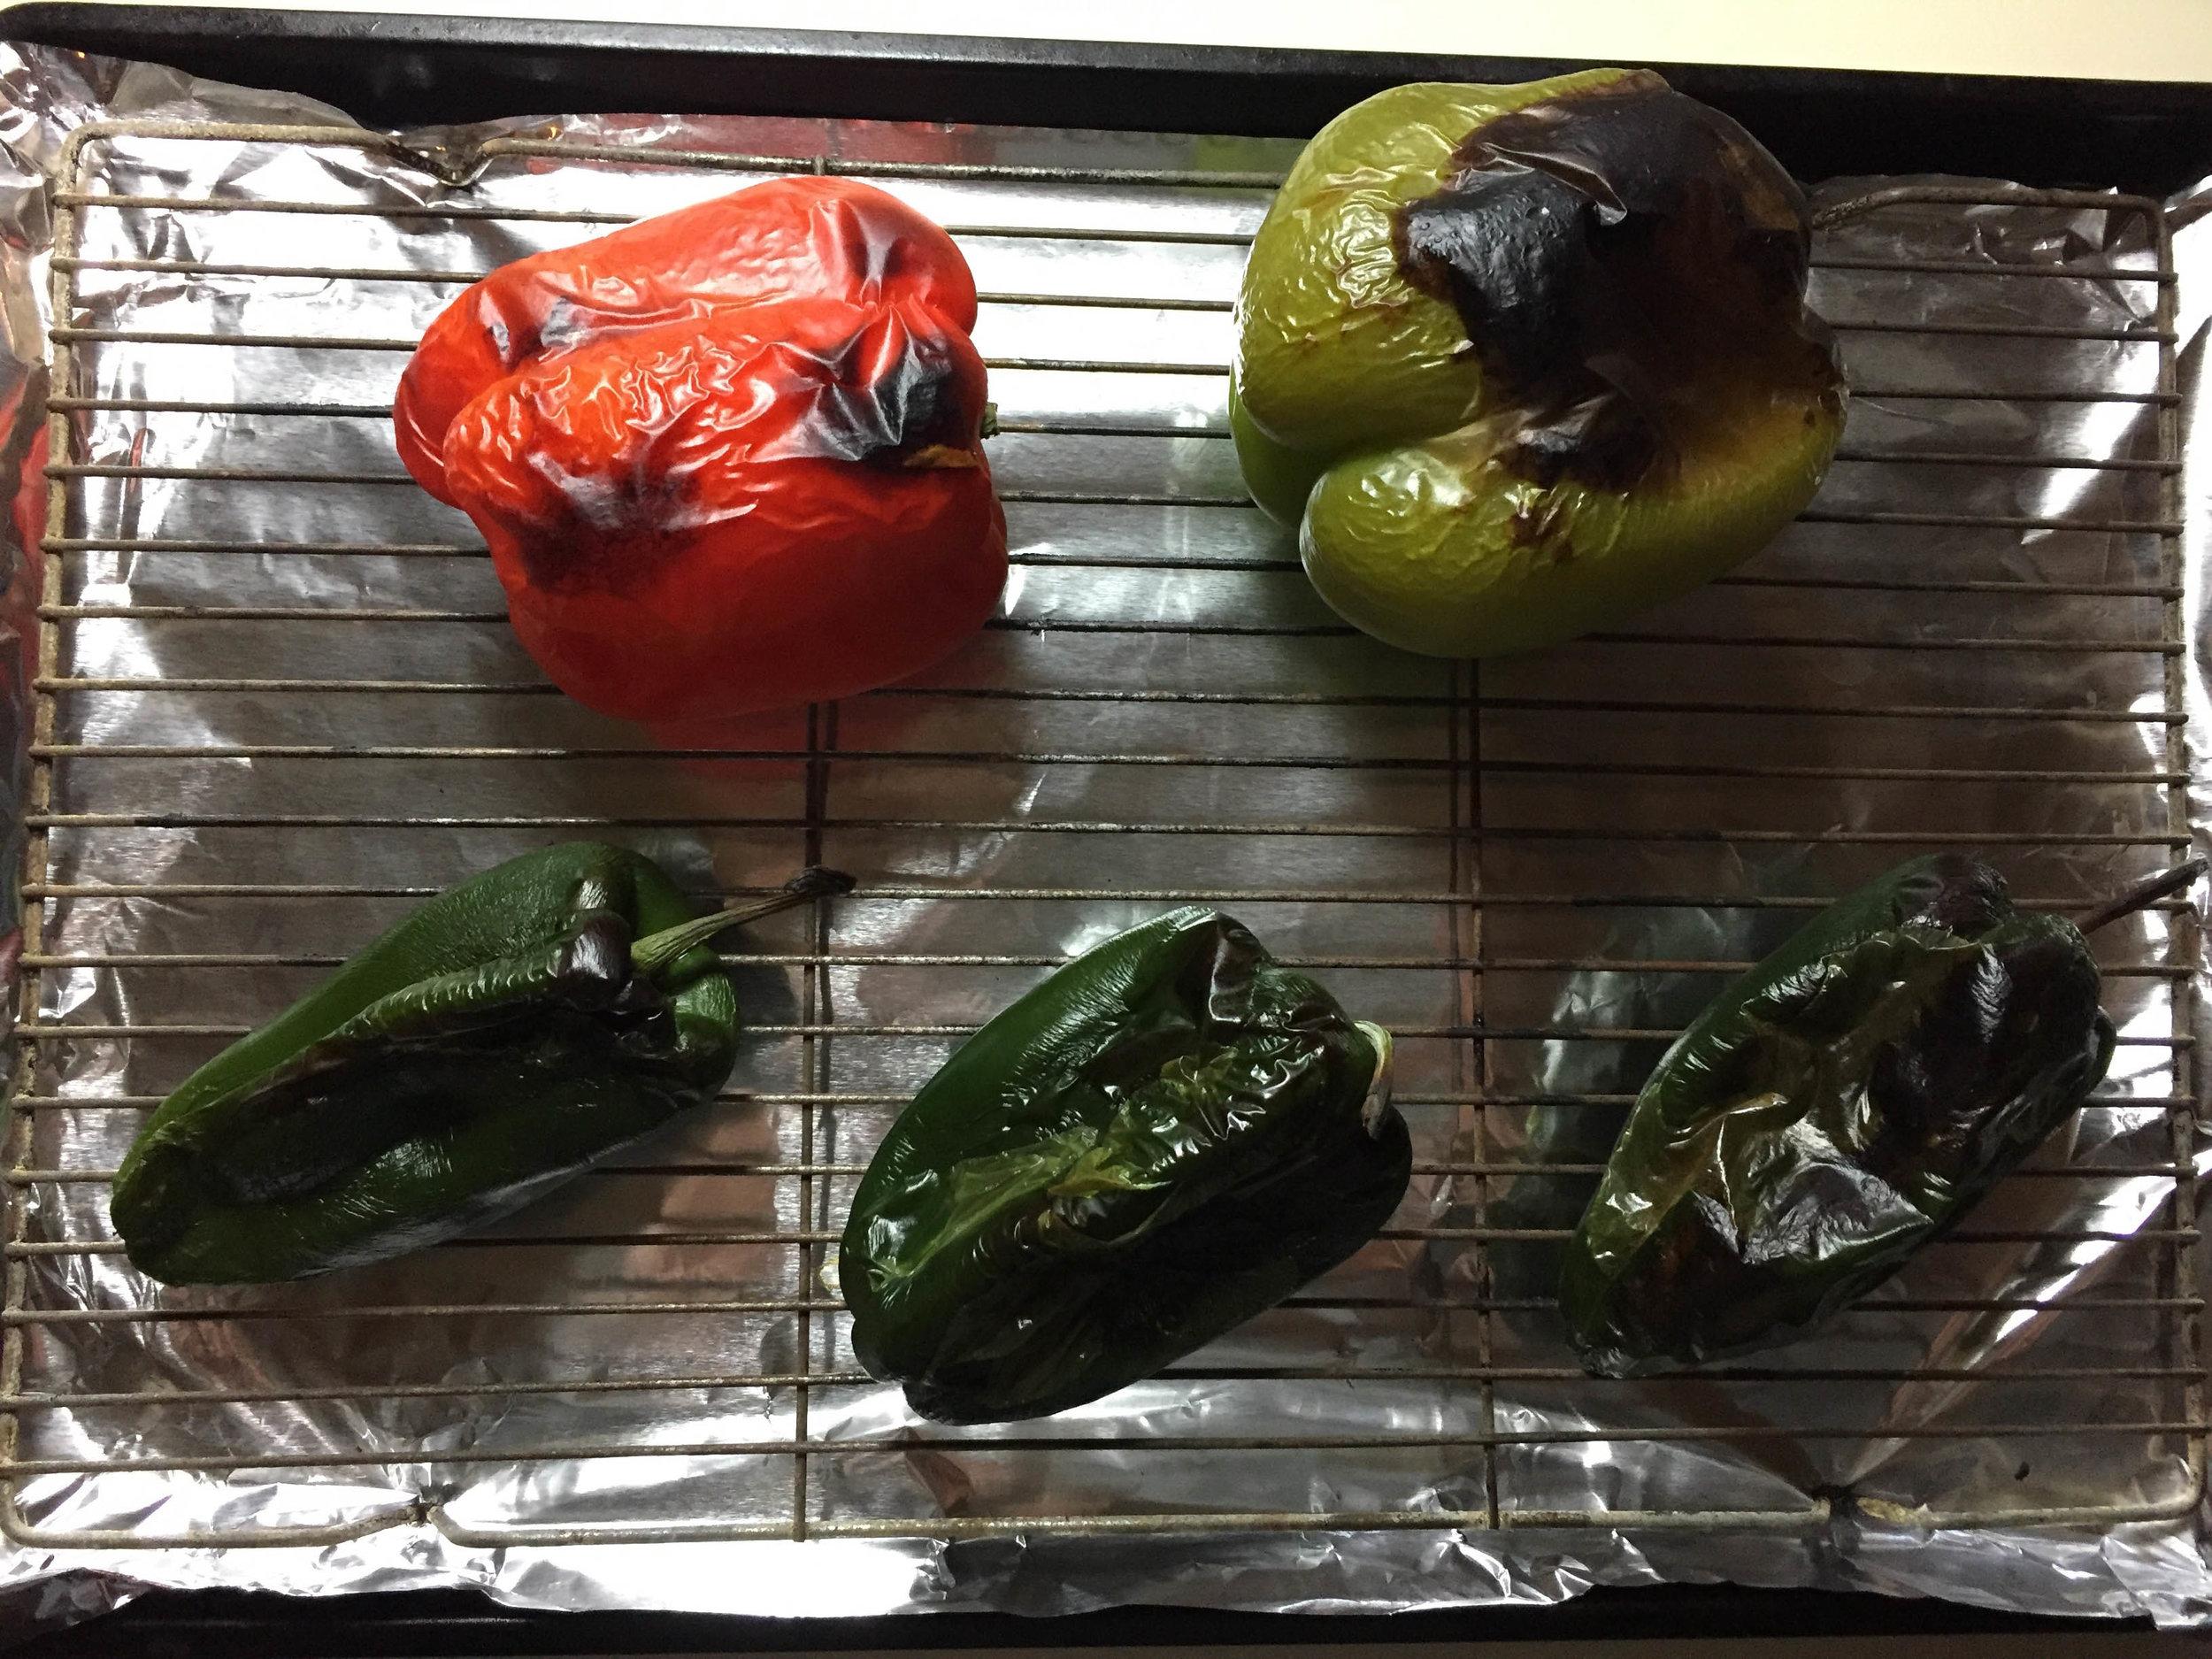 roasted_veggies_salad_chicken_main-5.jpg